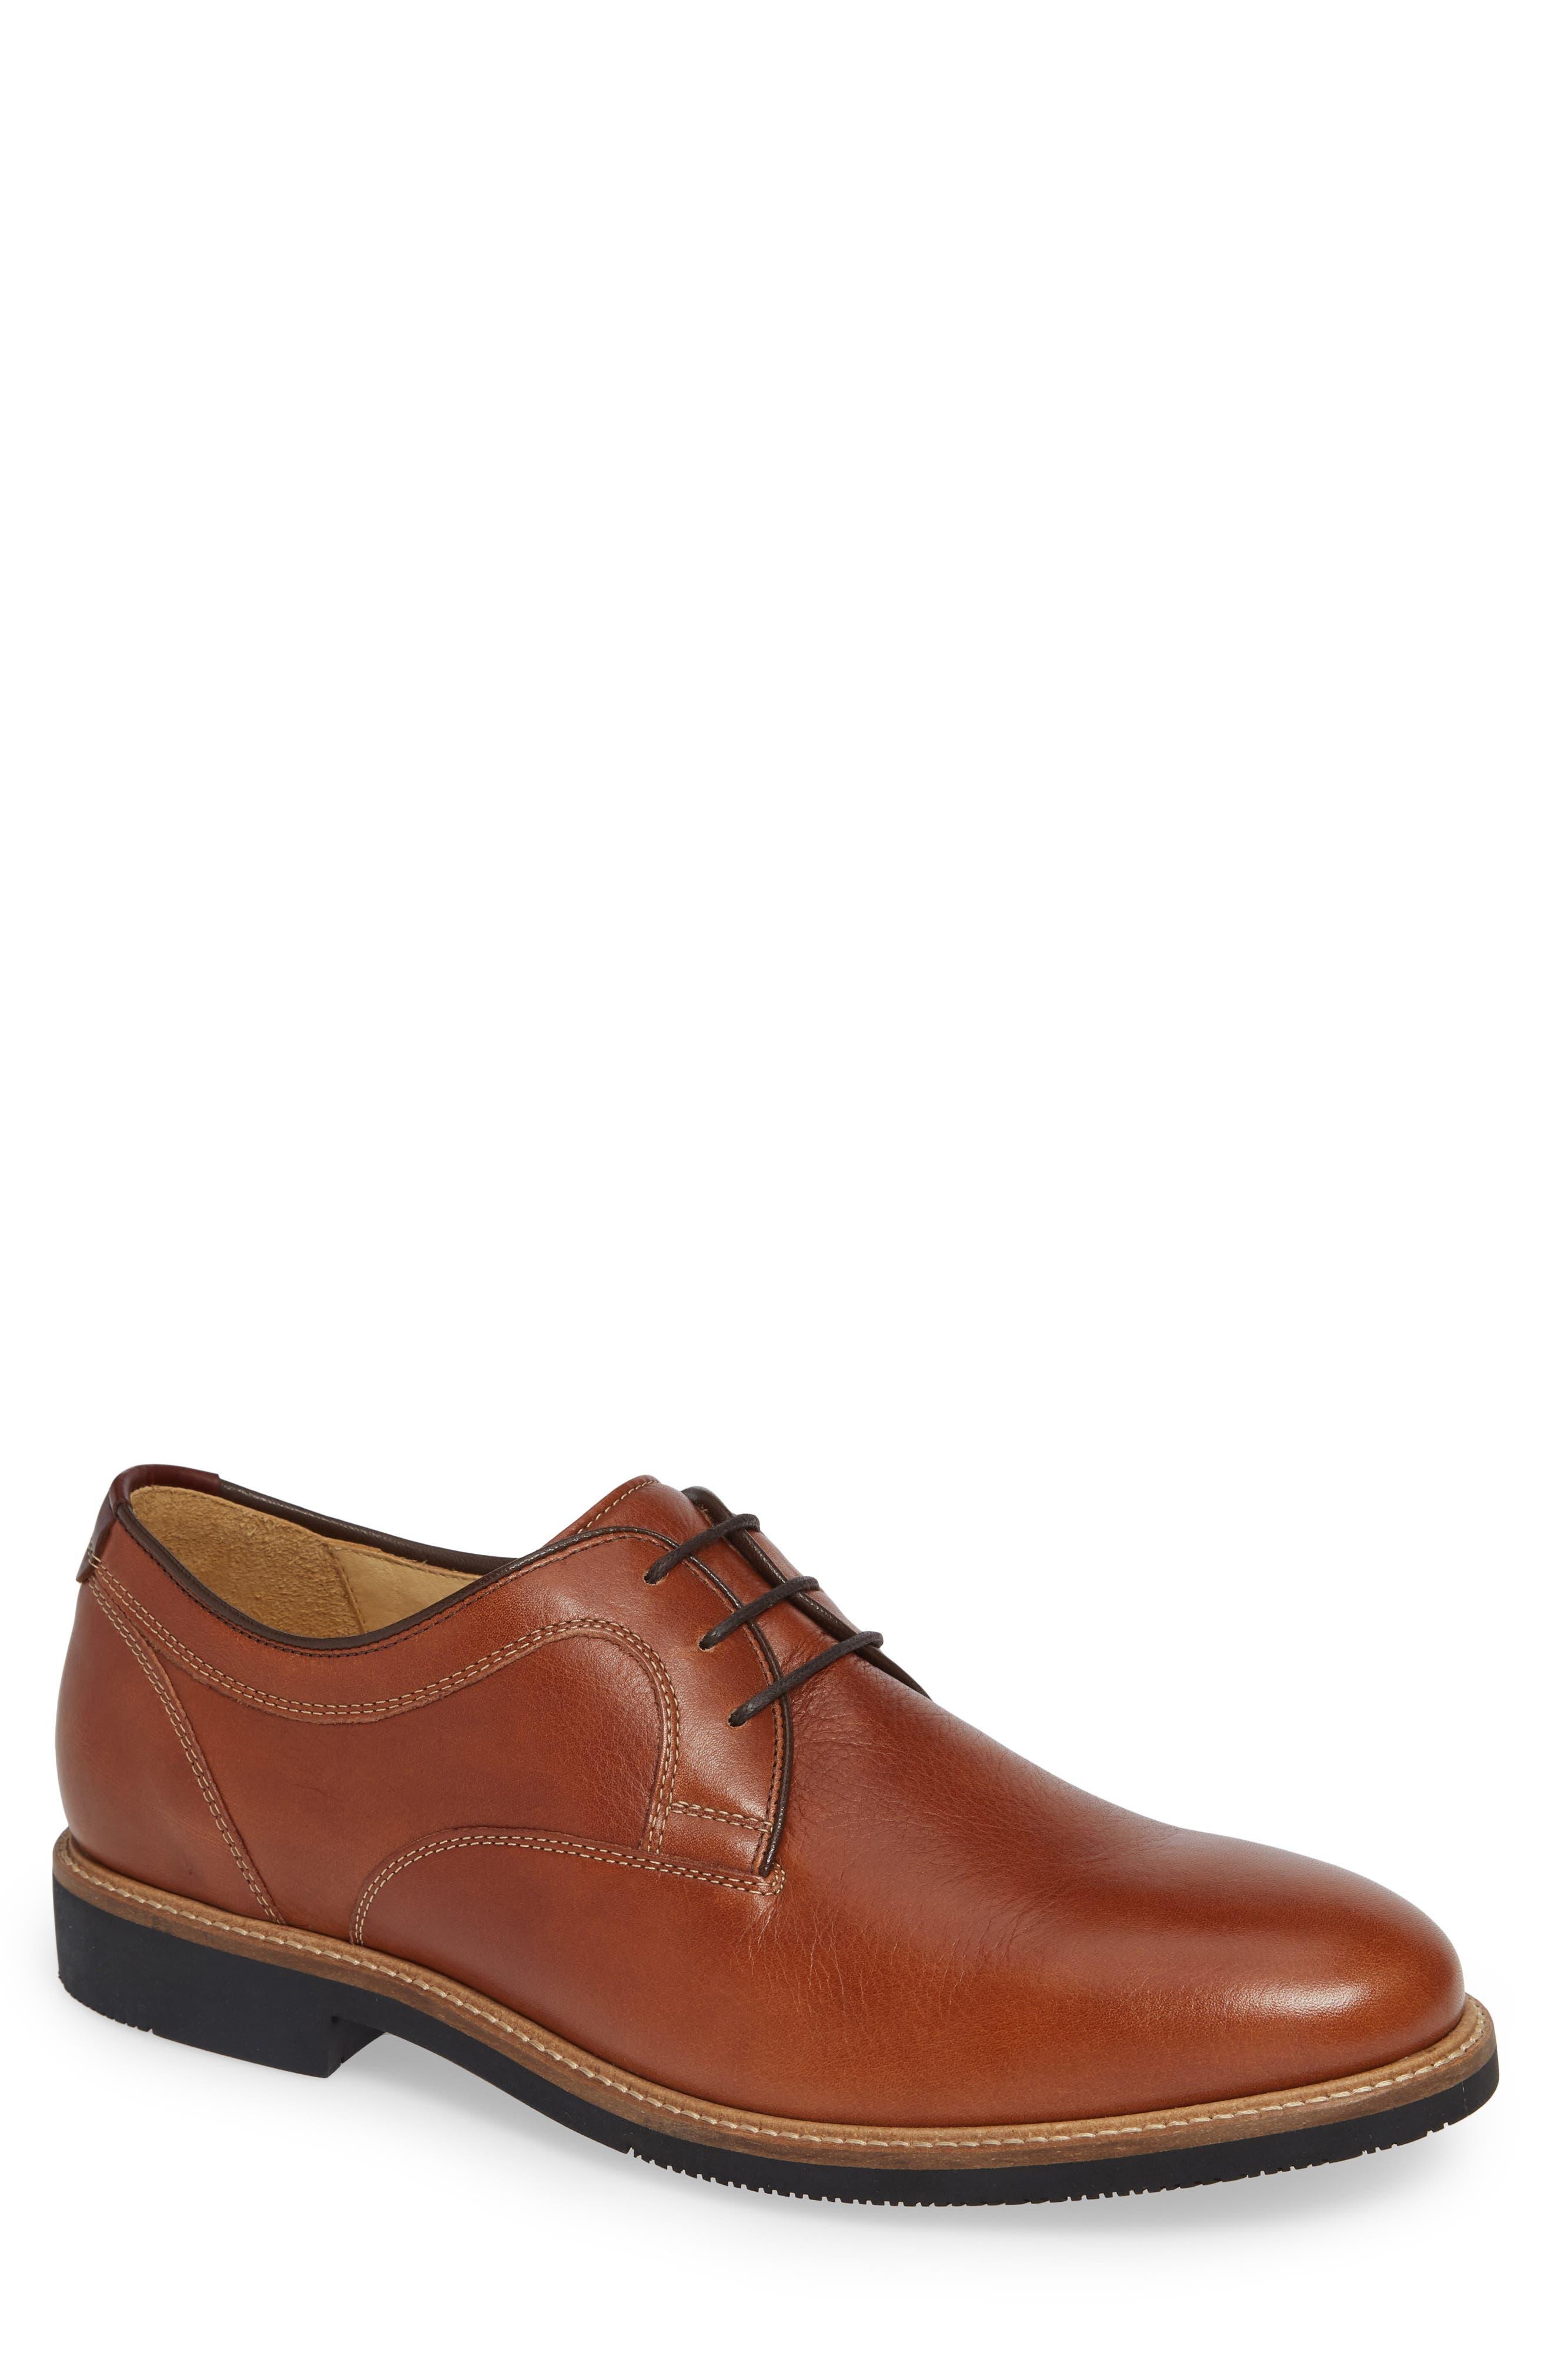 Barlow Plain Toe Derby,                         Main,                         color, Dark Tan Leather